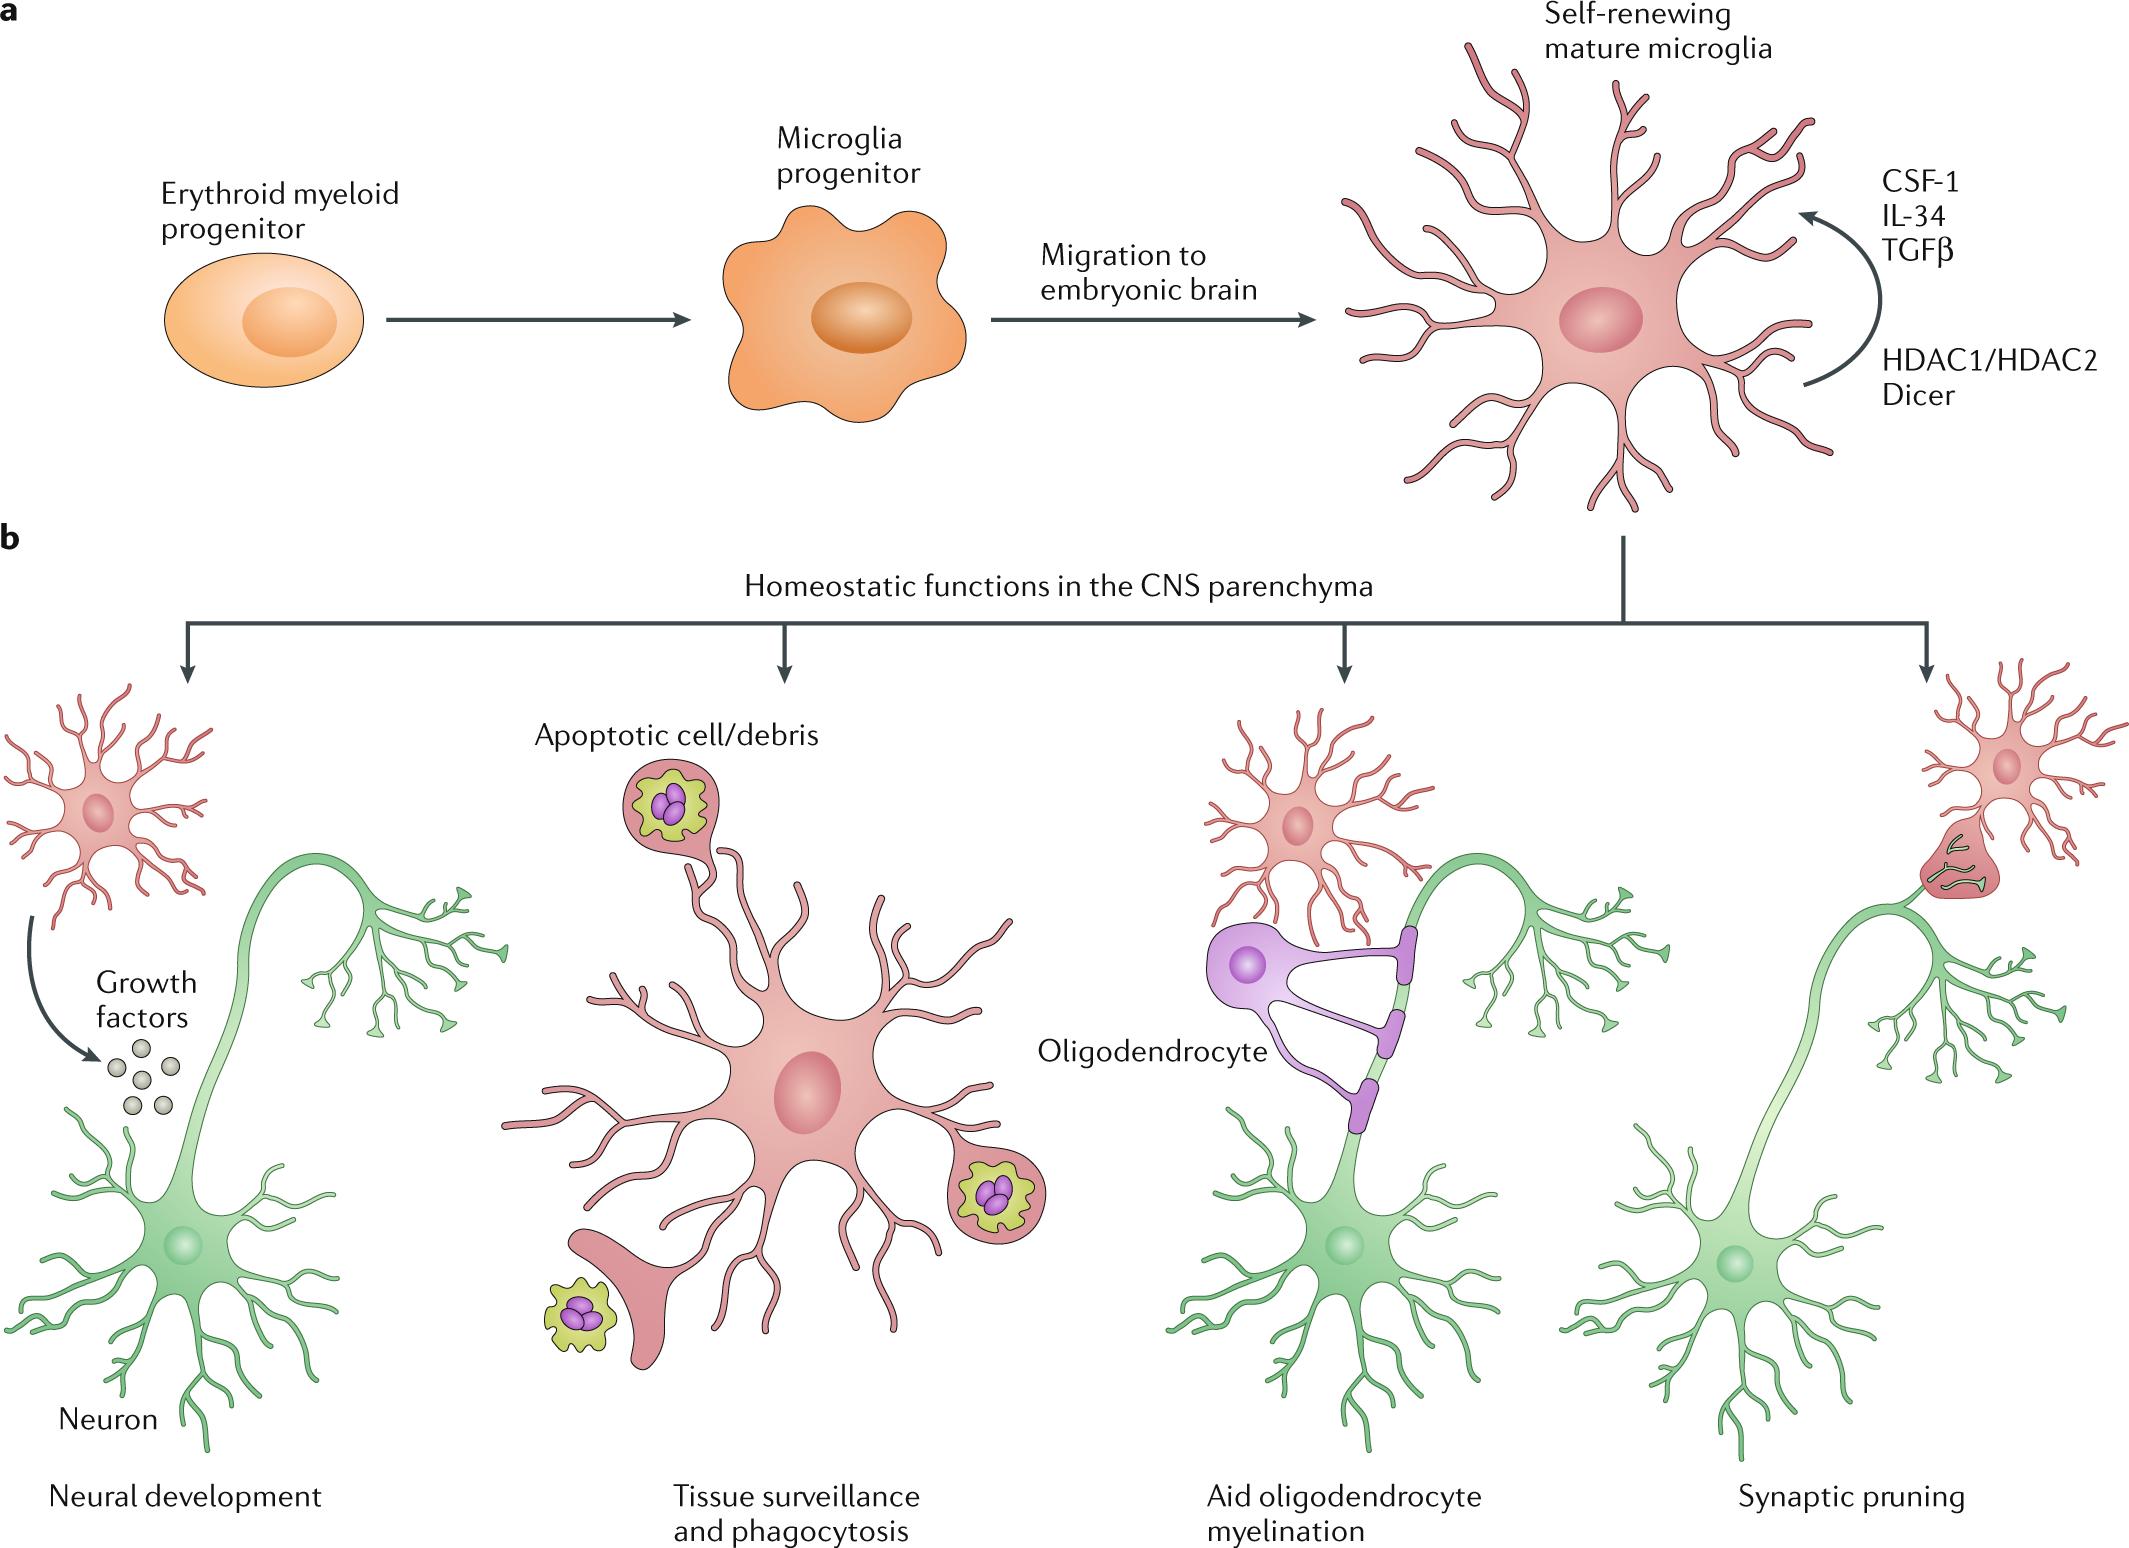 When encephalitogenic T cells collaborate with microglia in multiple s